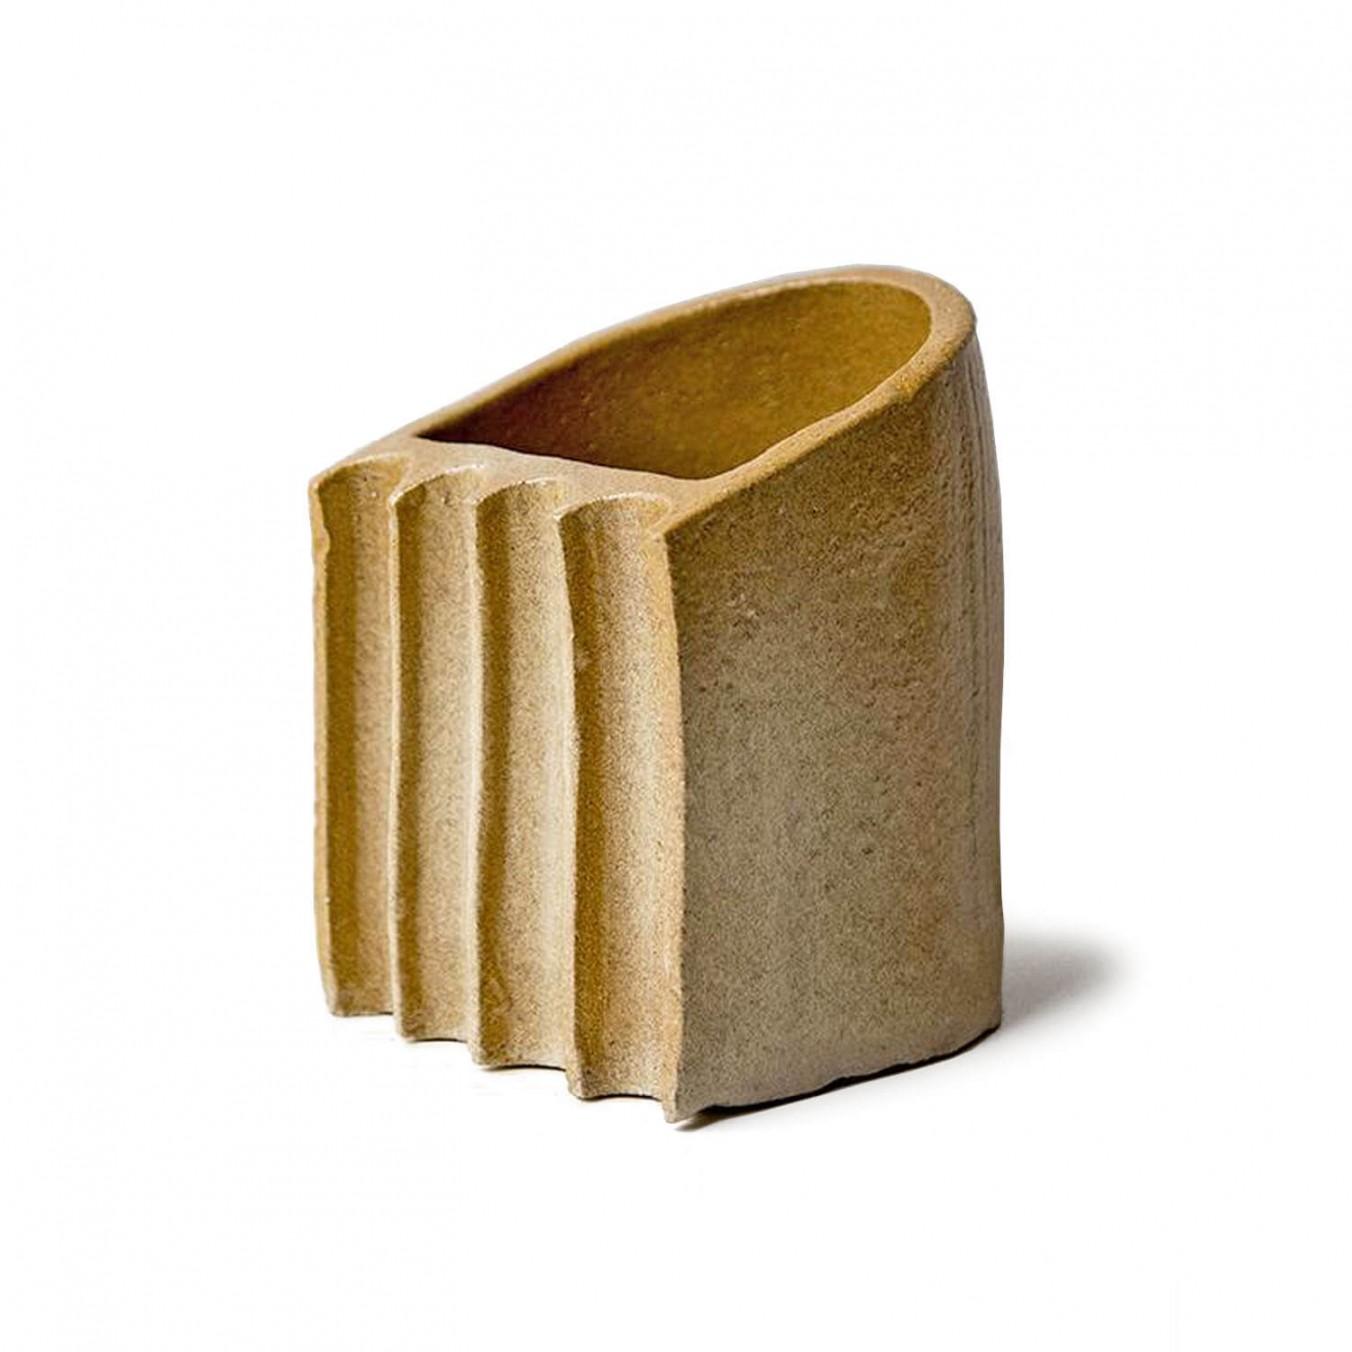 Model 2 vase - small